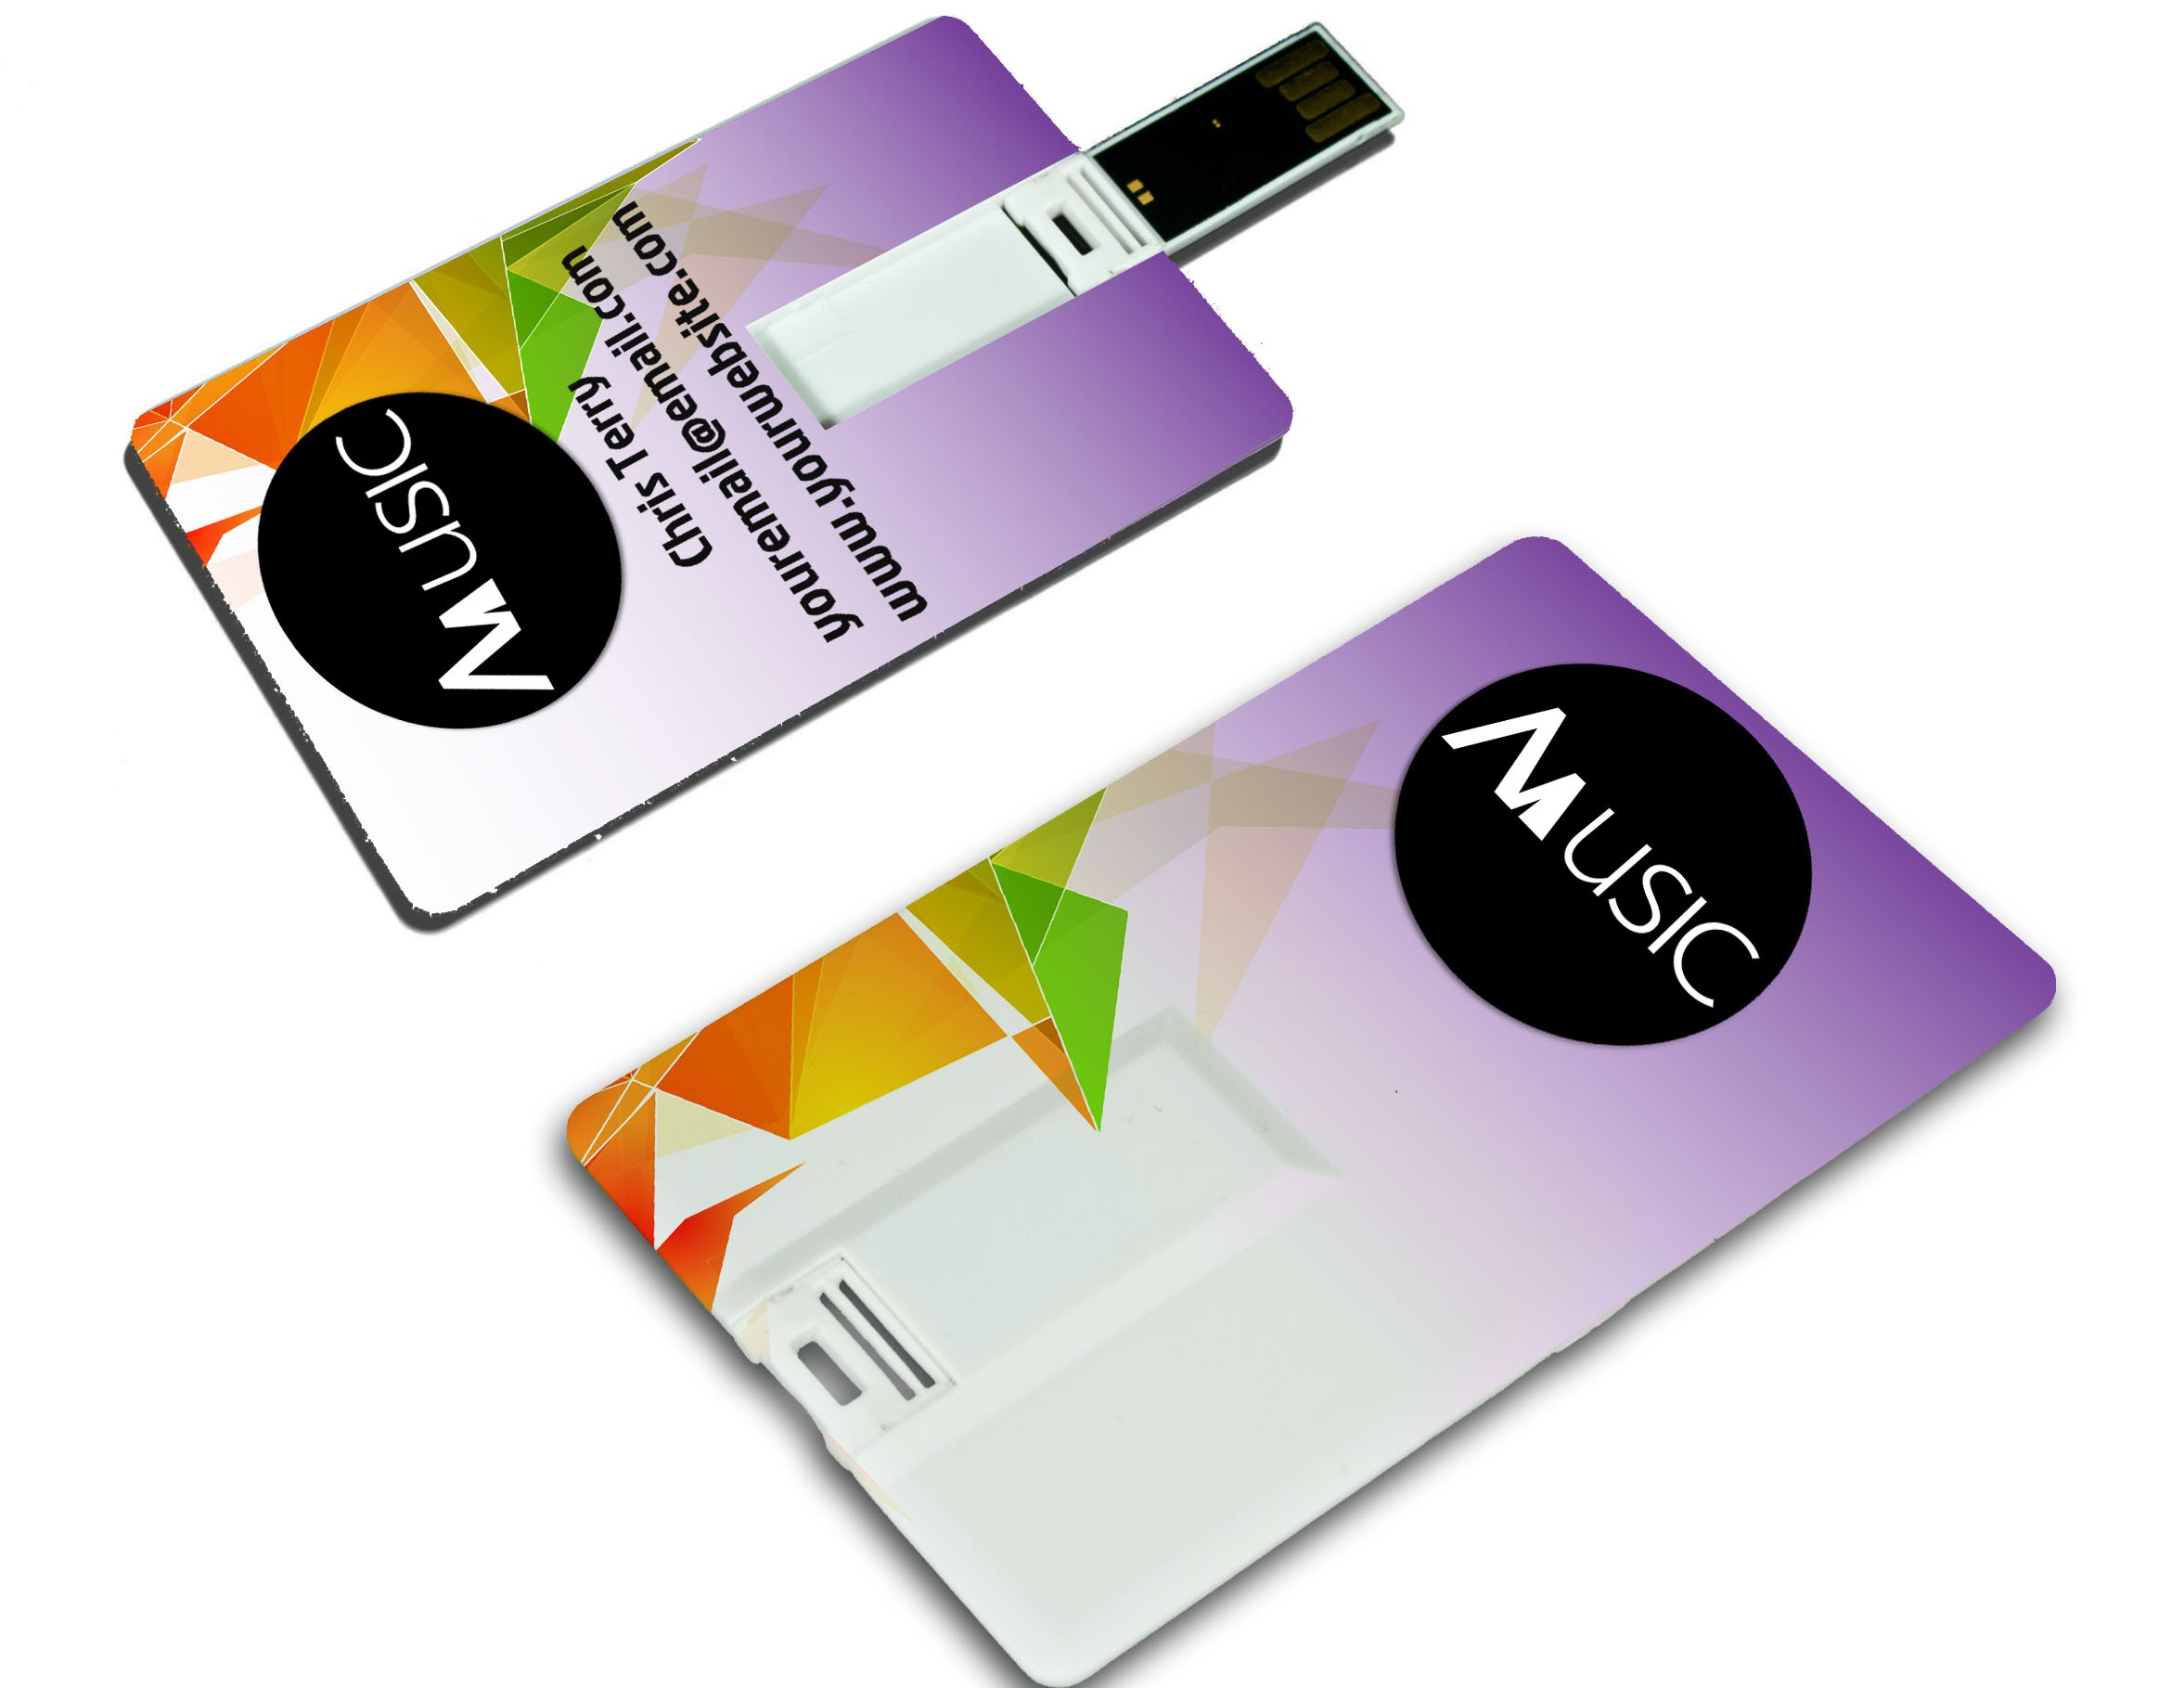 card-usb-with-uv-printing-in-dubai